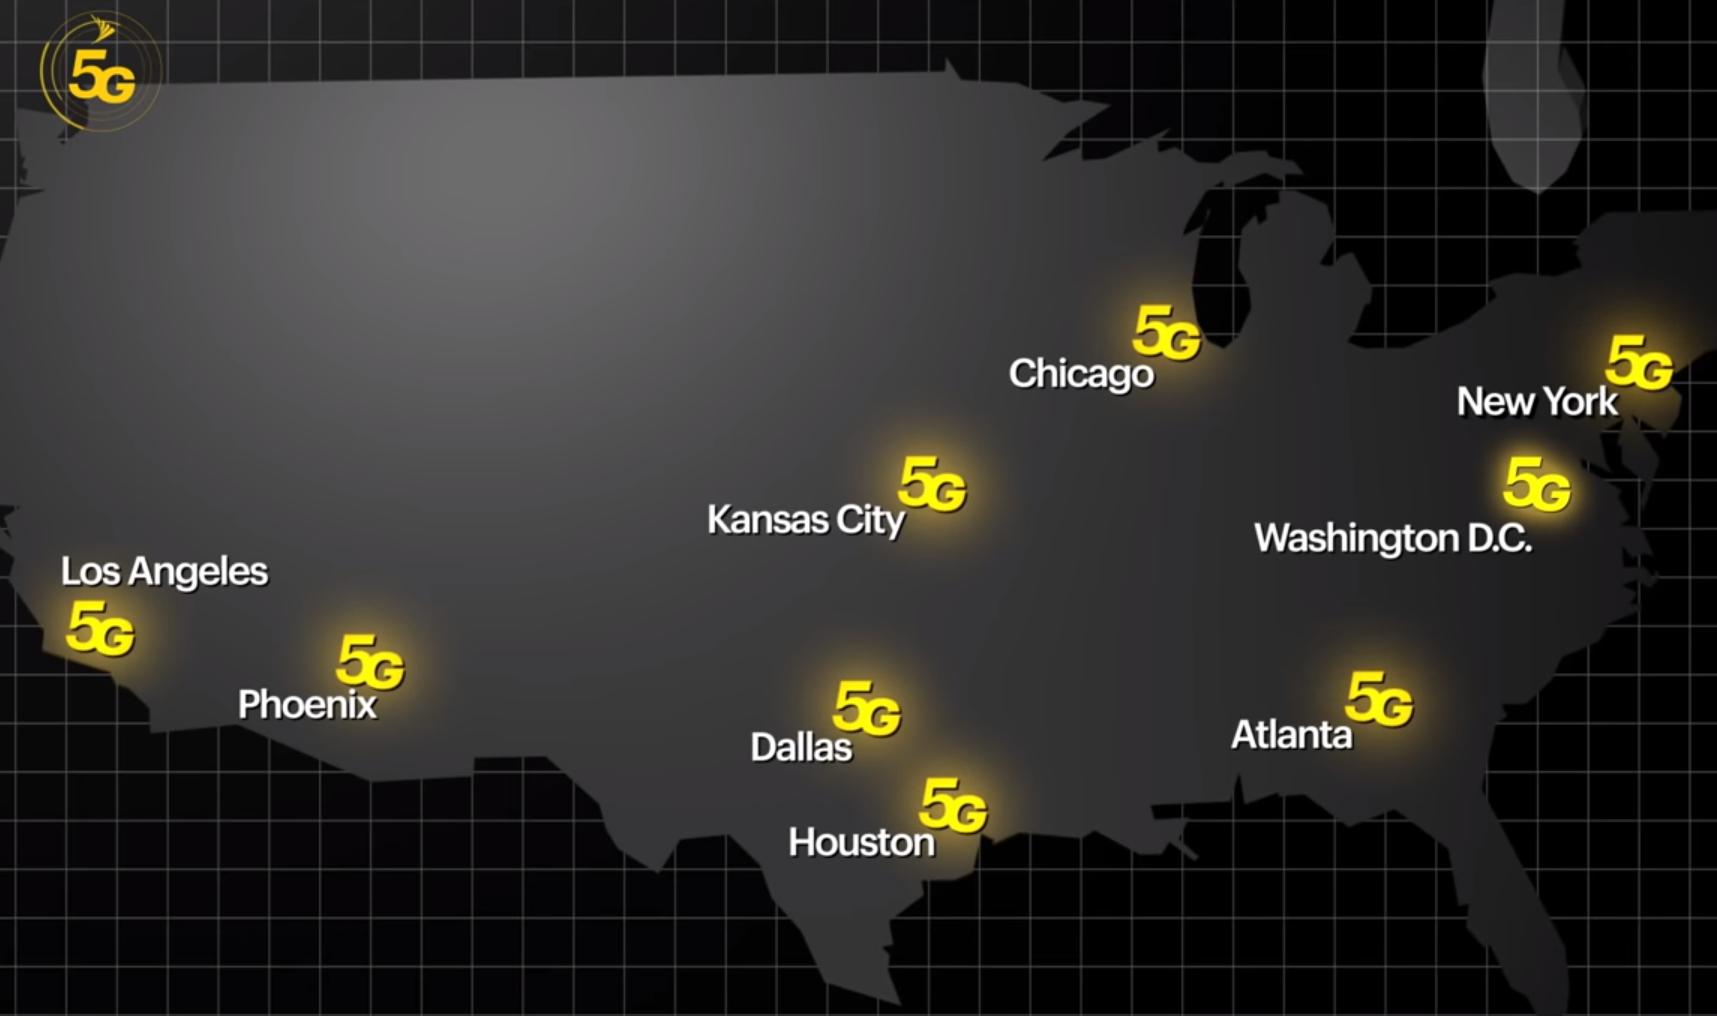 Sprint 5G cities